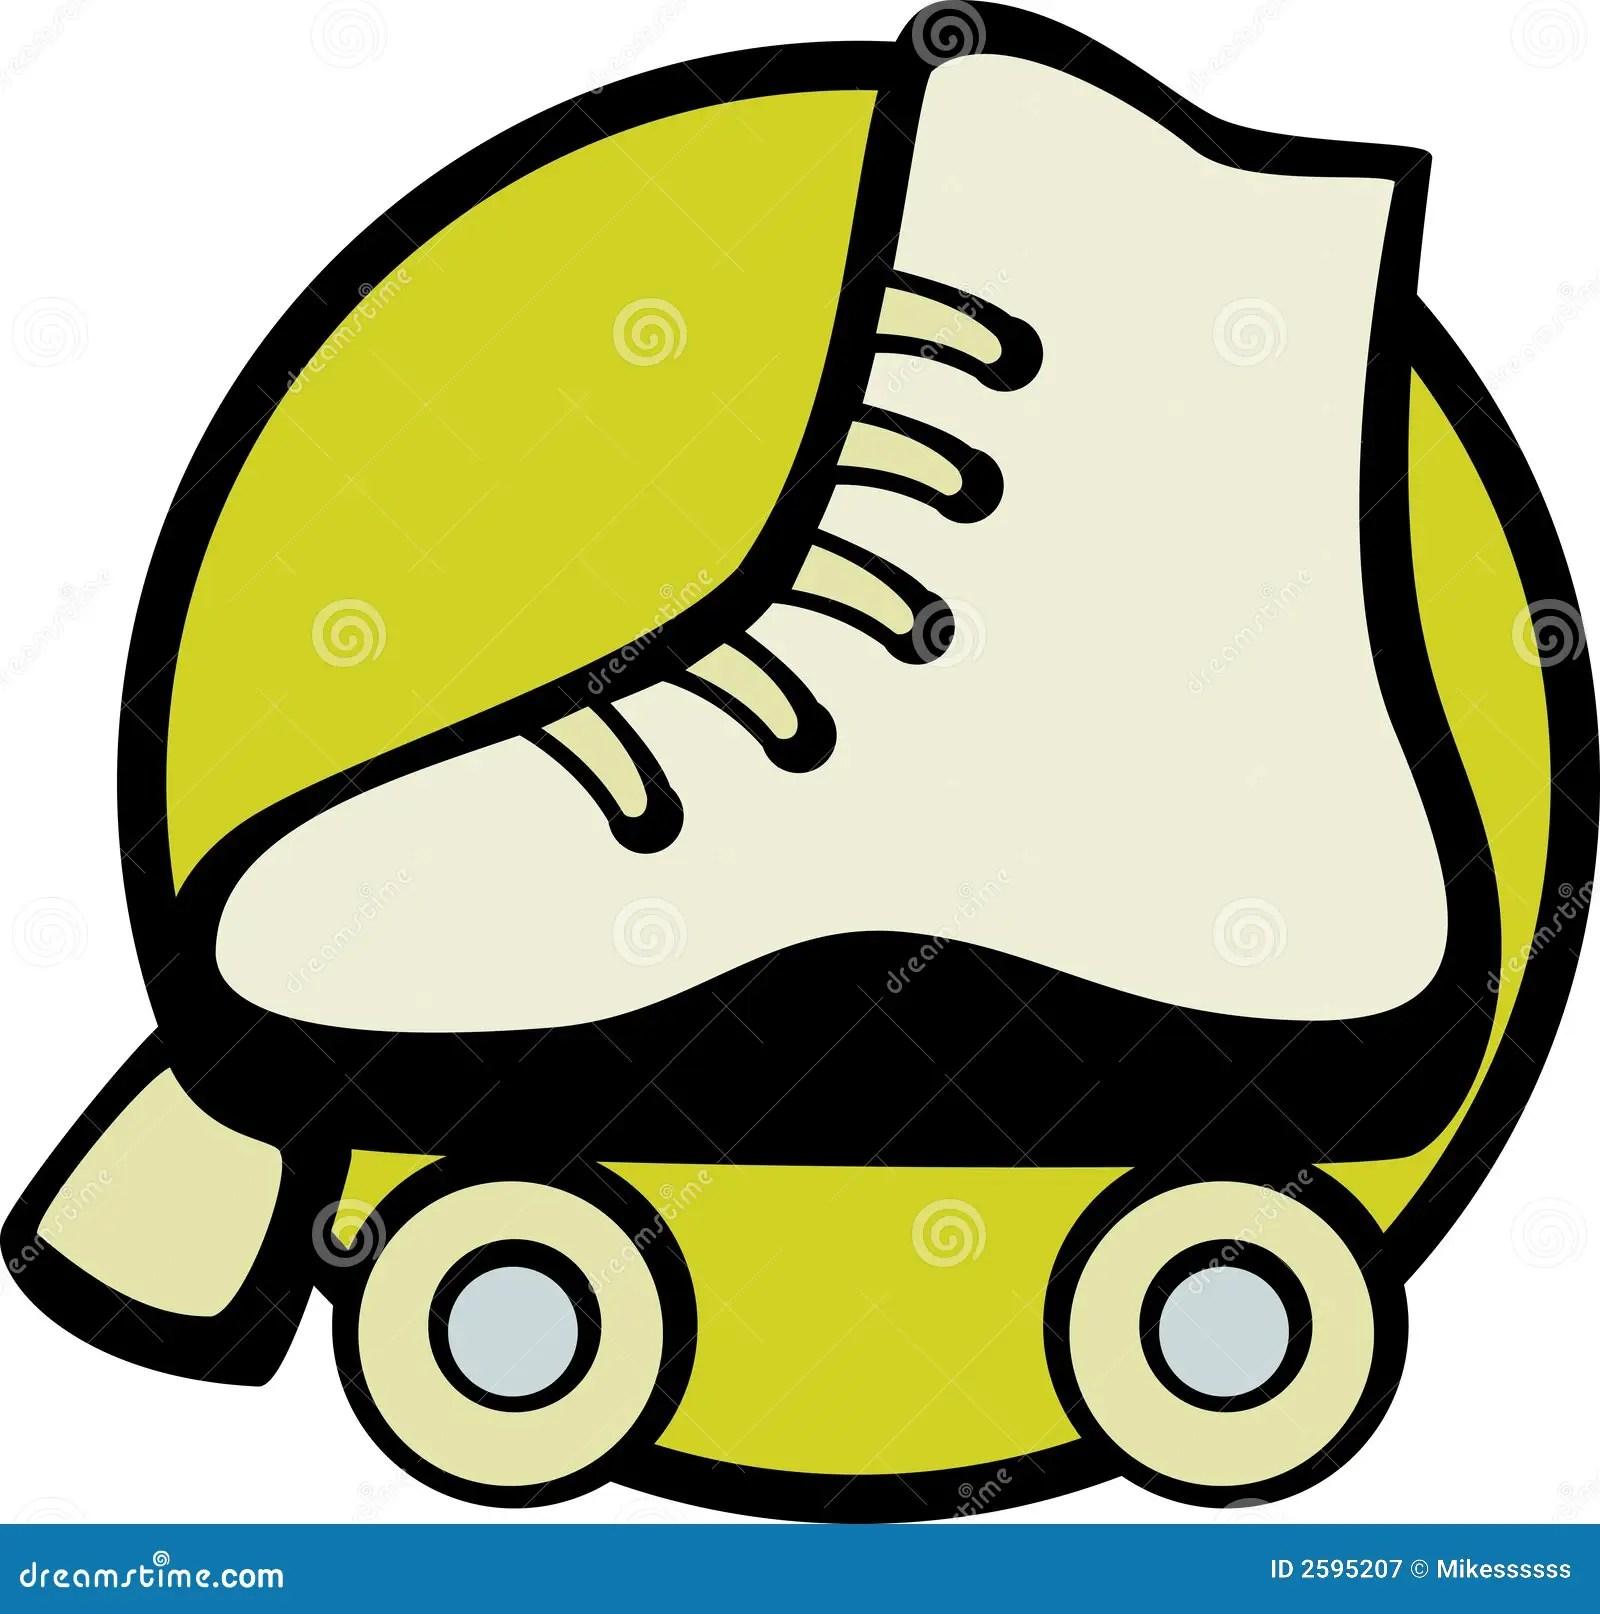 hight resolution of roller skate vector illustration vector illustration of a roller skate royalty free illustration